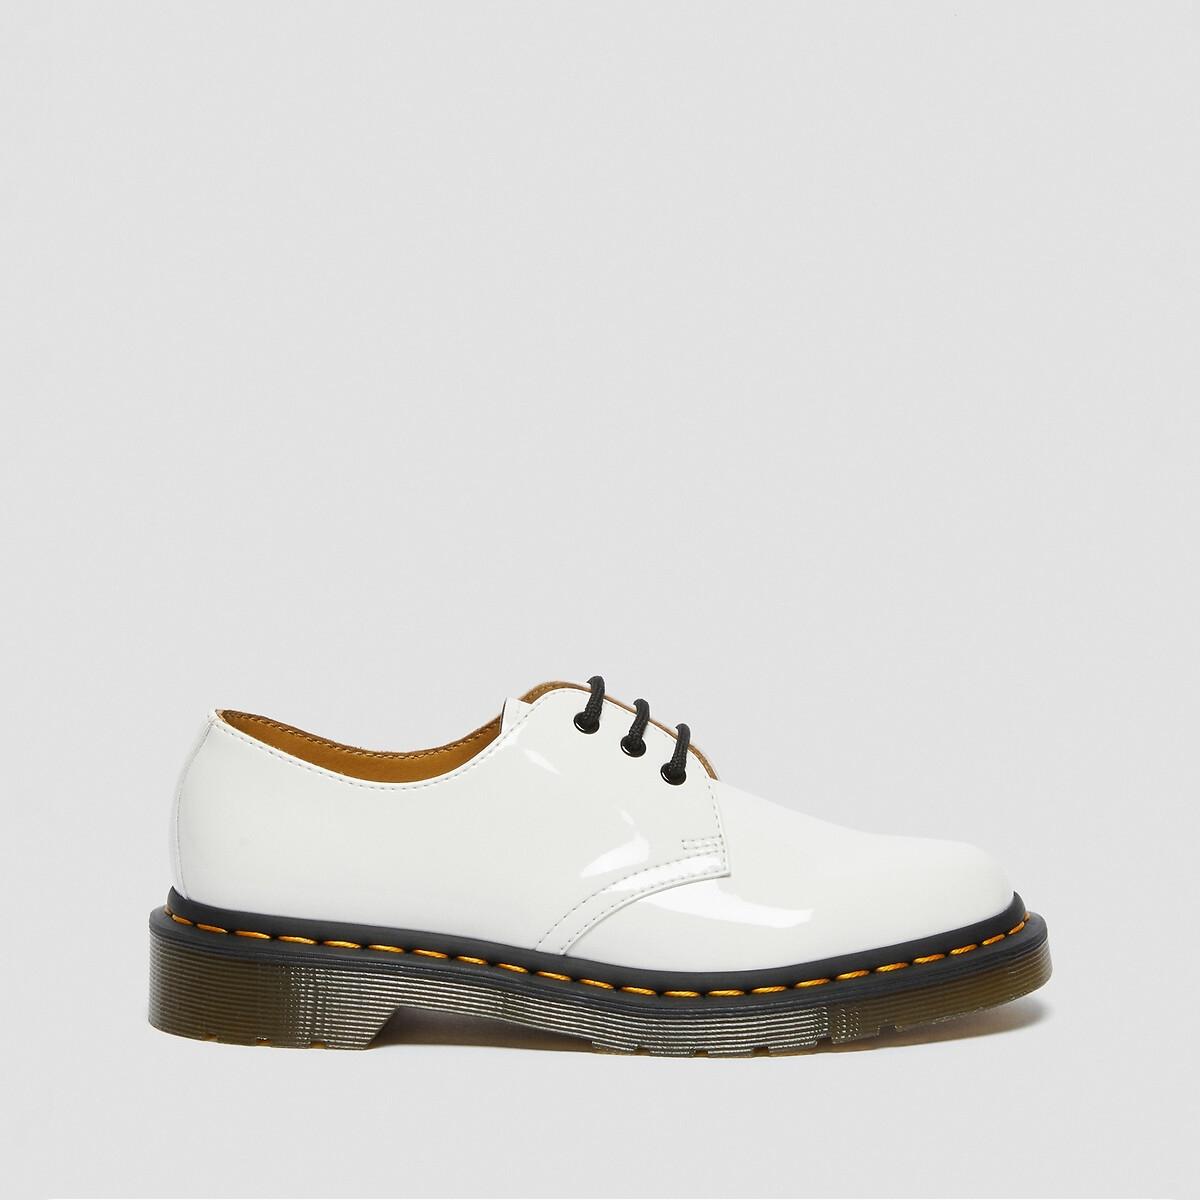 Ботинки-дерби LaRedoute Из лакированной кожи на шнуровке 41 белый ботинки дерби из кожи teadale maira